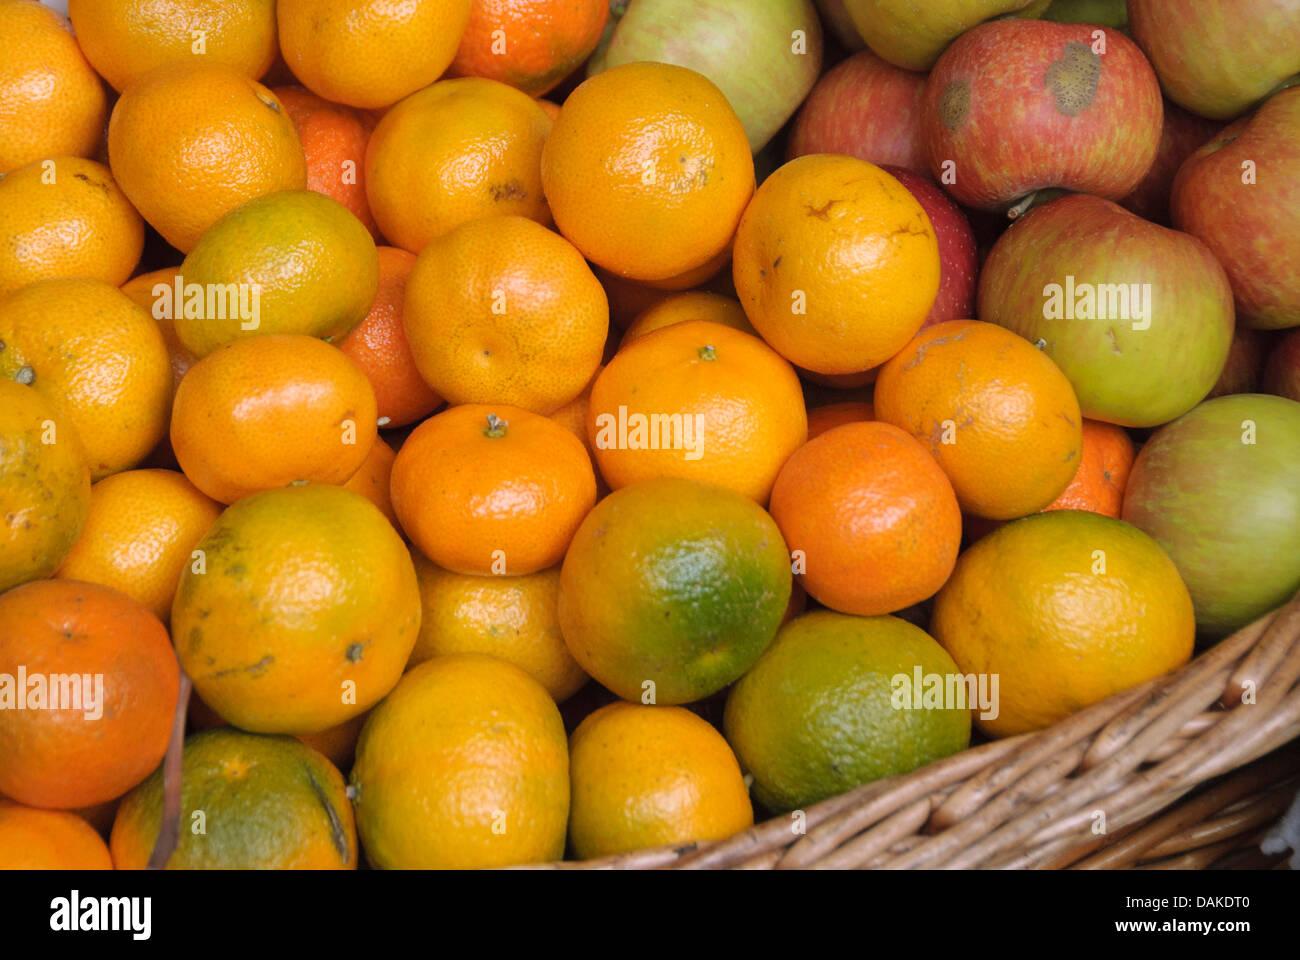 mandarin, tangerine (Citrus reticulata), basket with mandarines - Stock Image